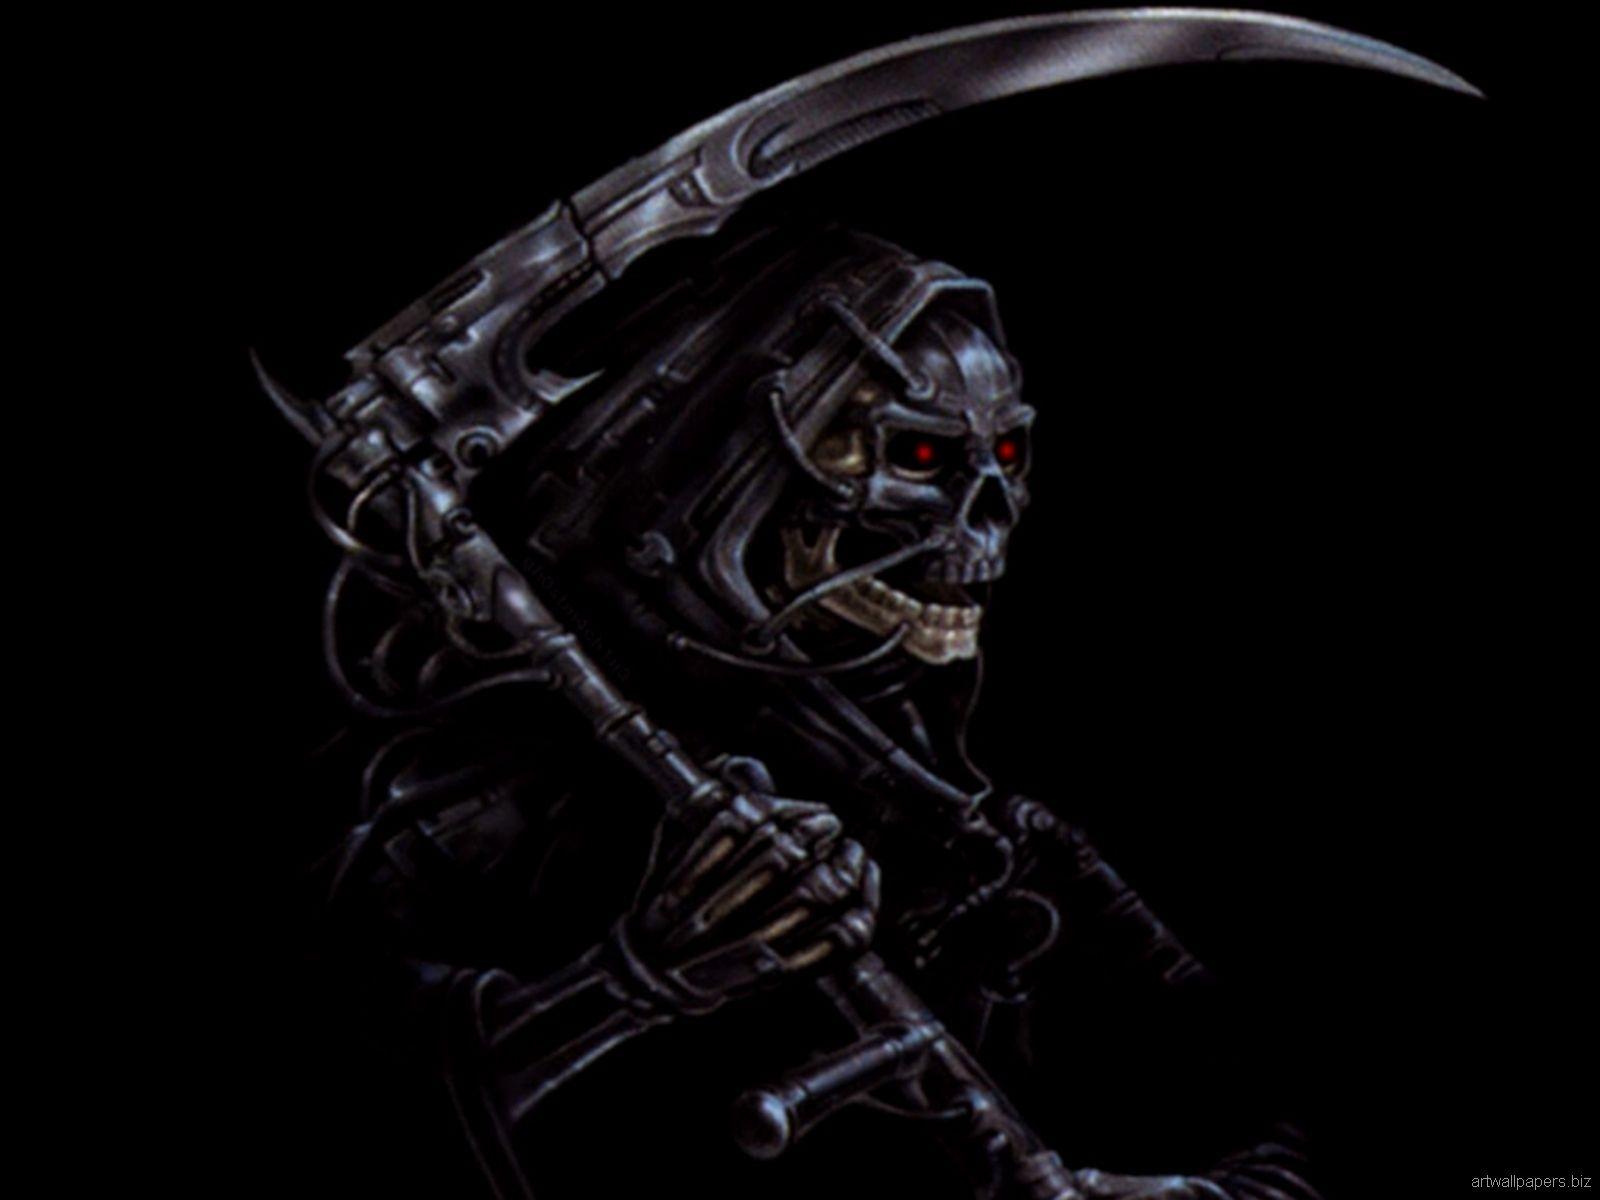 Download 3D Skull Wallpaper Wide 1w2 O NgepLuk